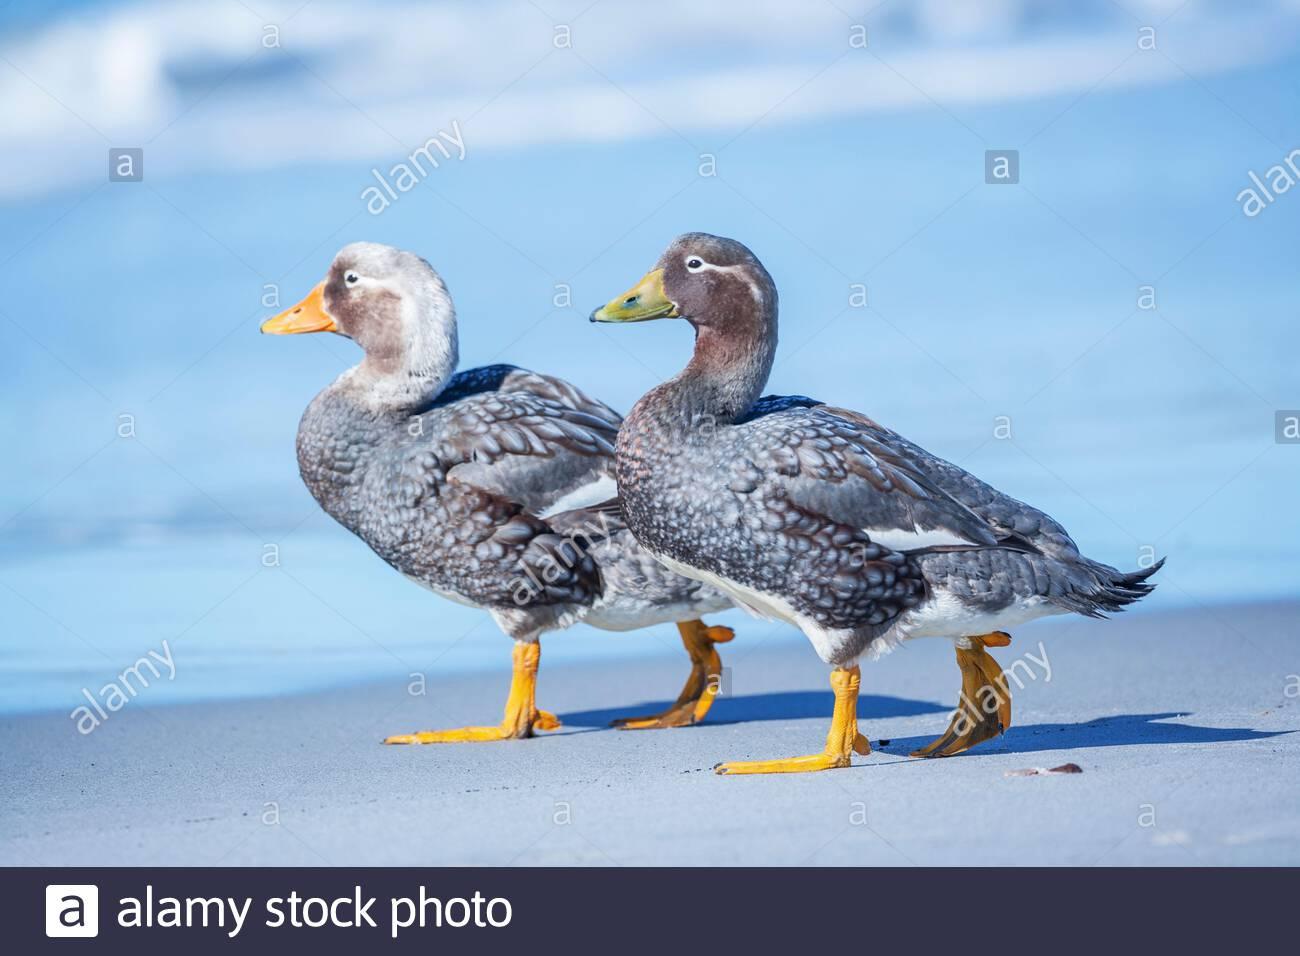 Steamer ducks (Tachyeres brachypterus) walking, Falkland Islands, South America Stock Photo